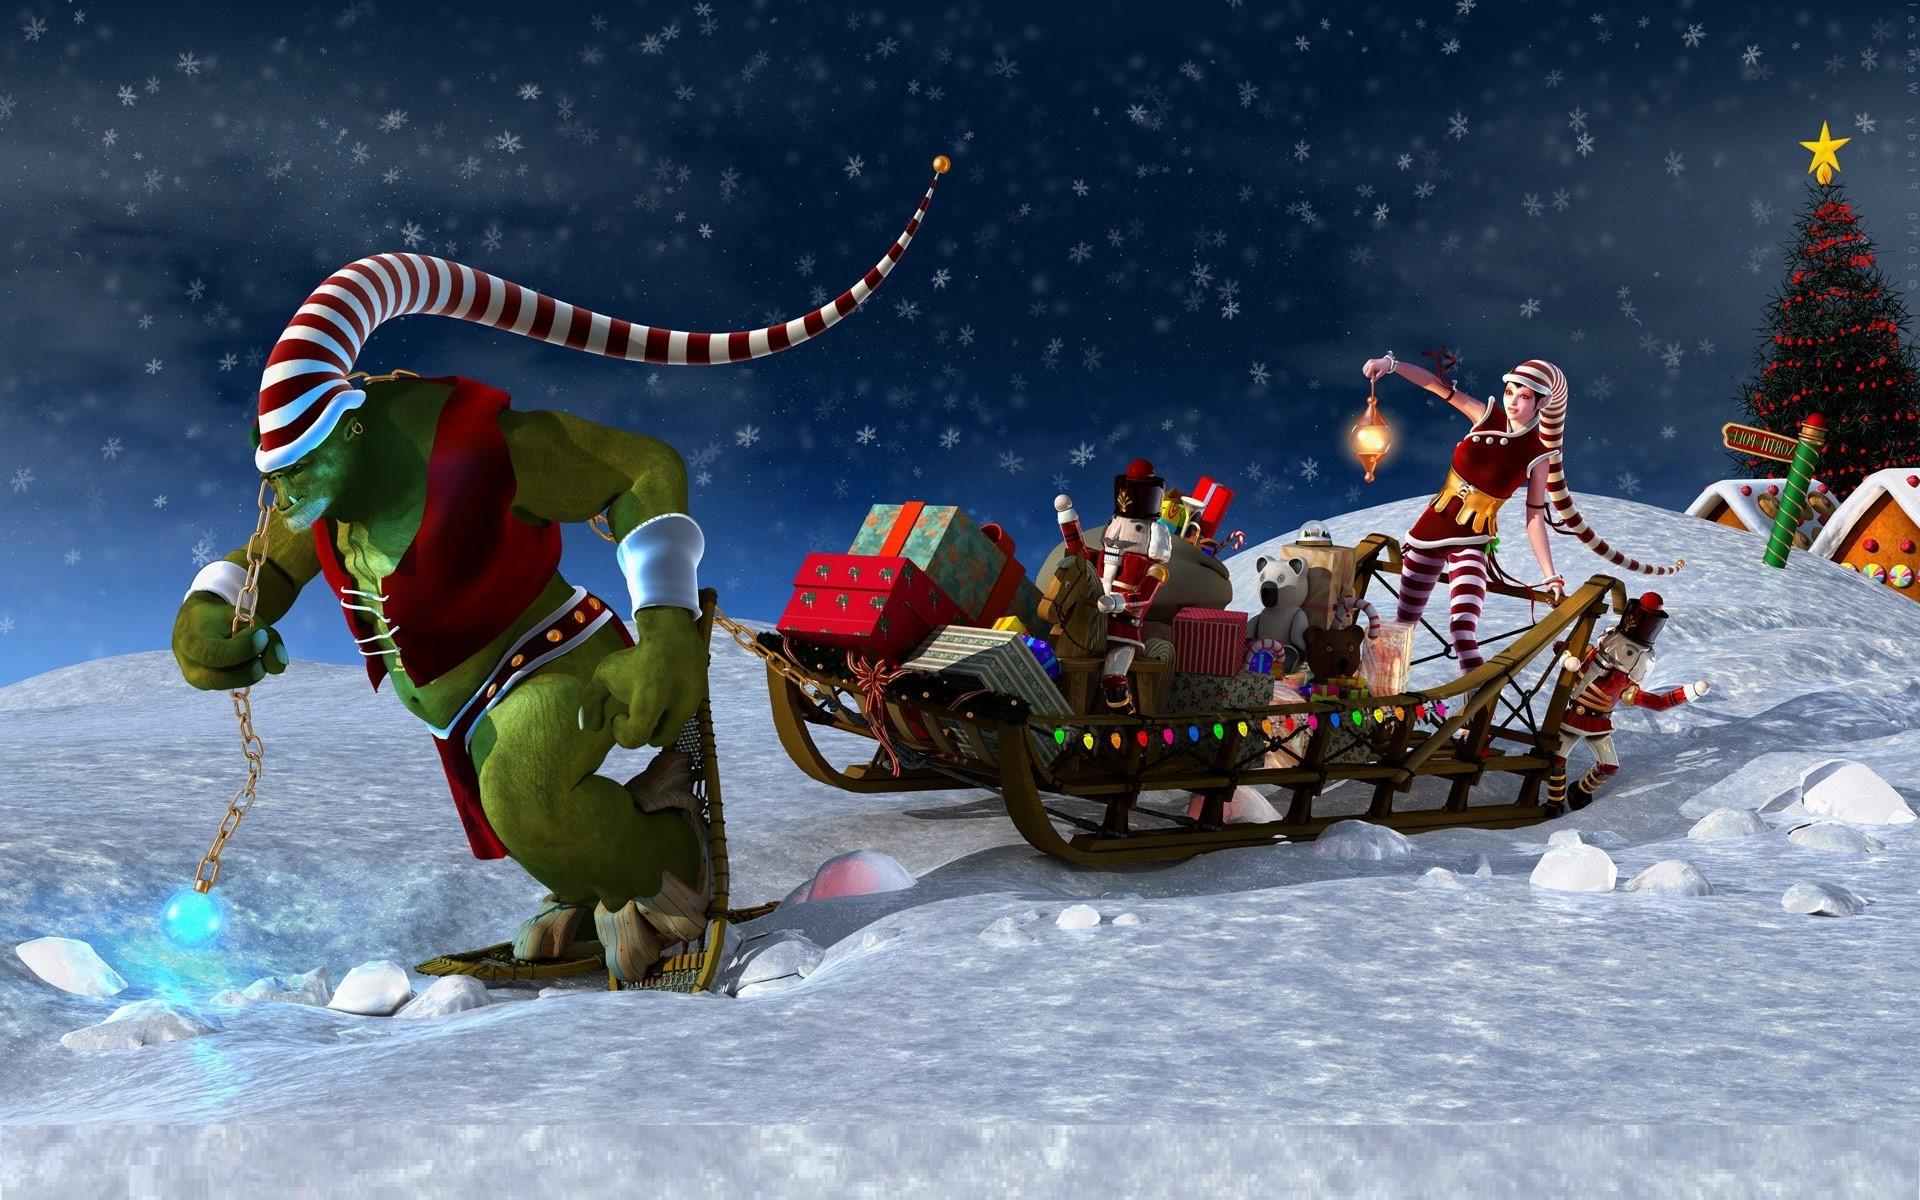 Animated Christmas Desktop Wallpaper Wallpapers9 1920x1200